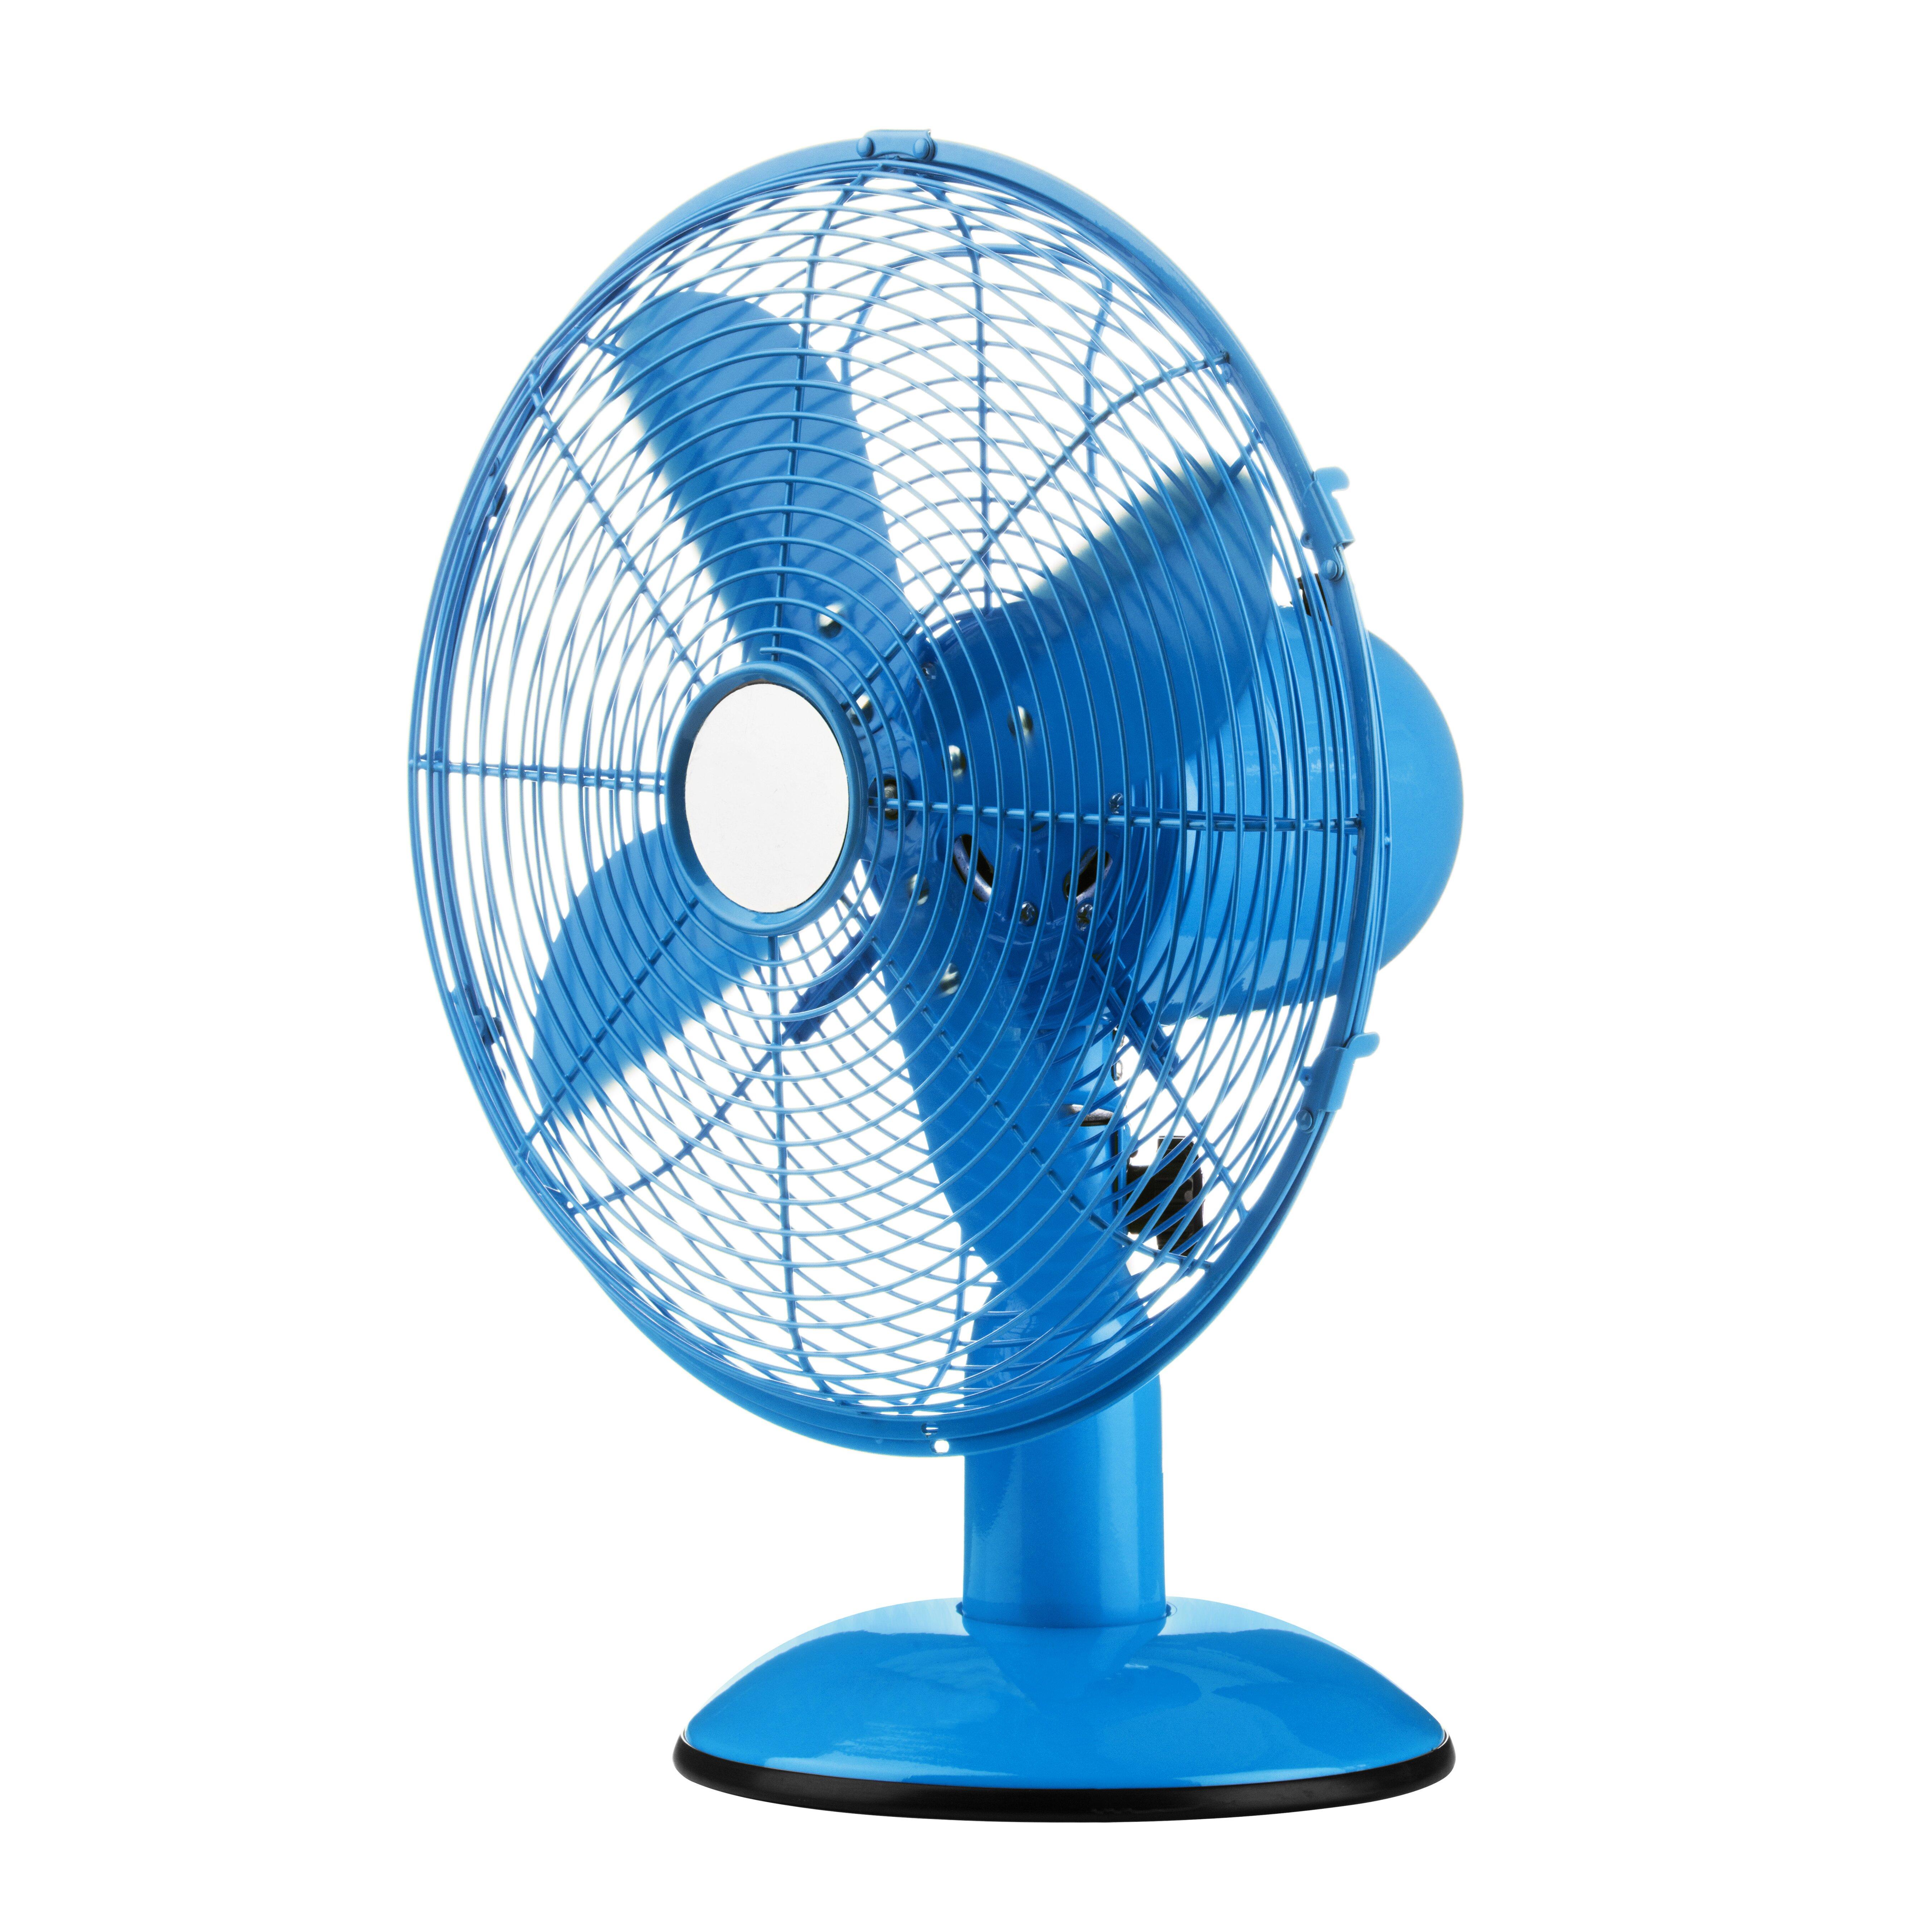 Oscillating Table Fans : All home cm oscillating table fan wayfair uk